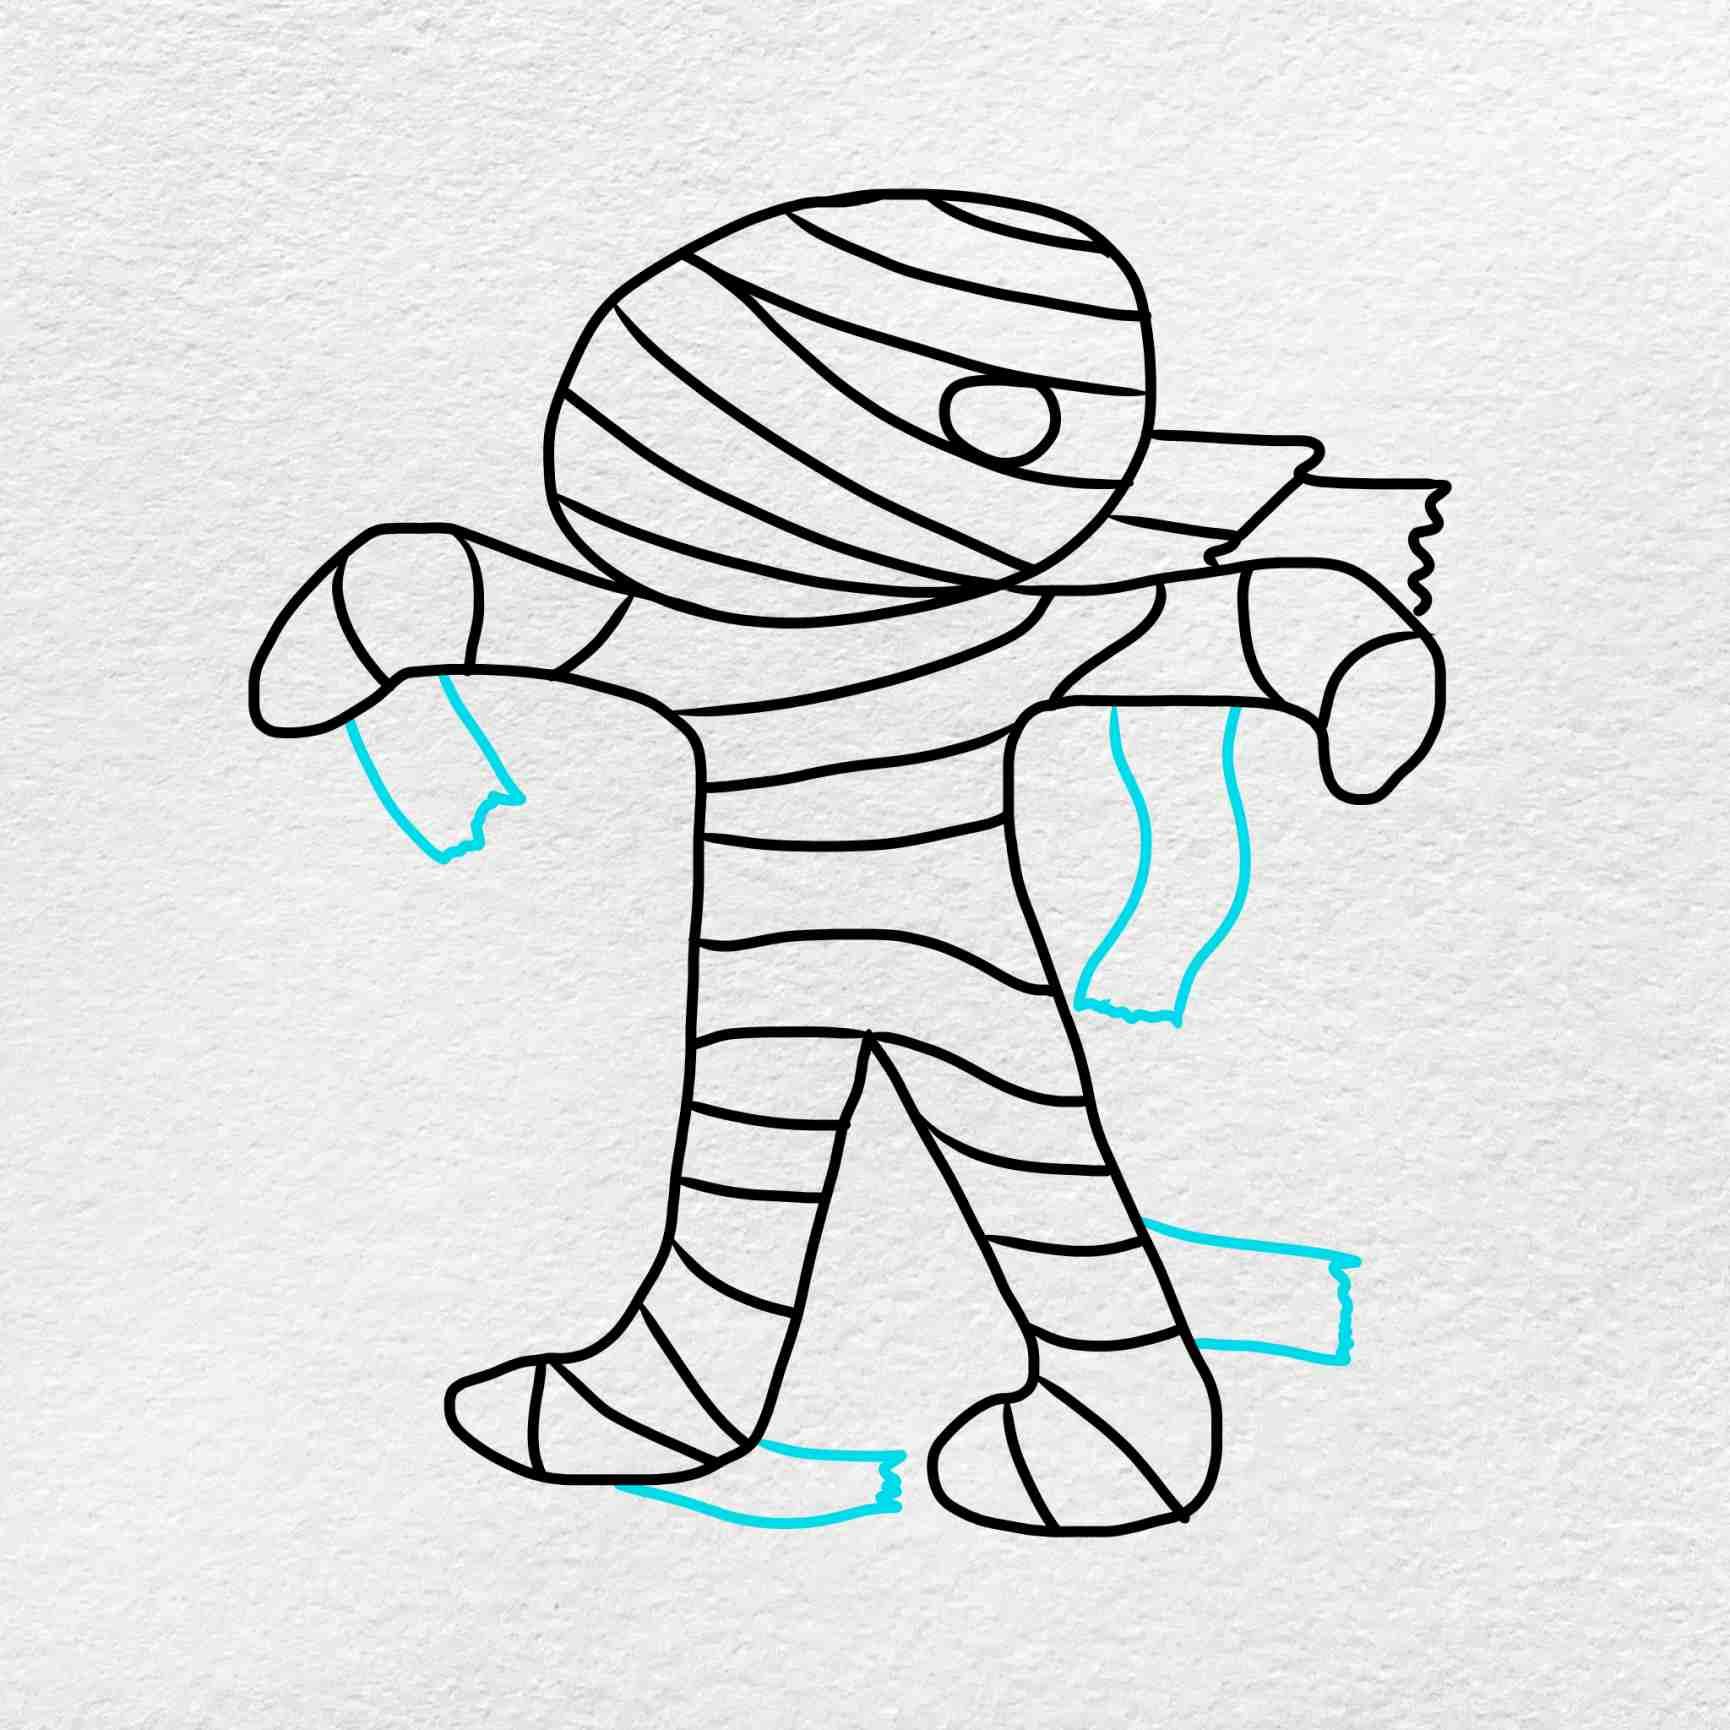 Mummy Drawing: Step 5